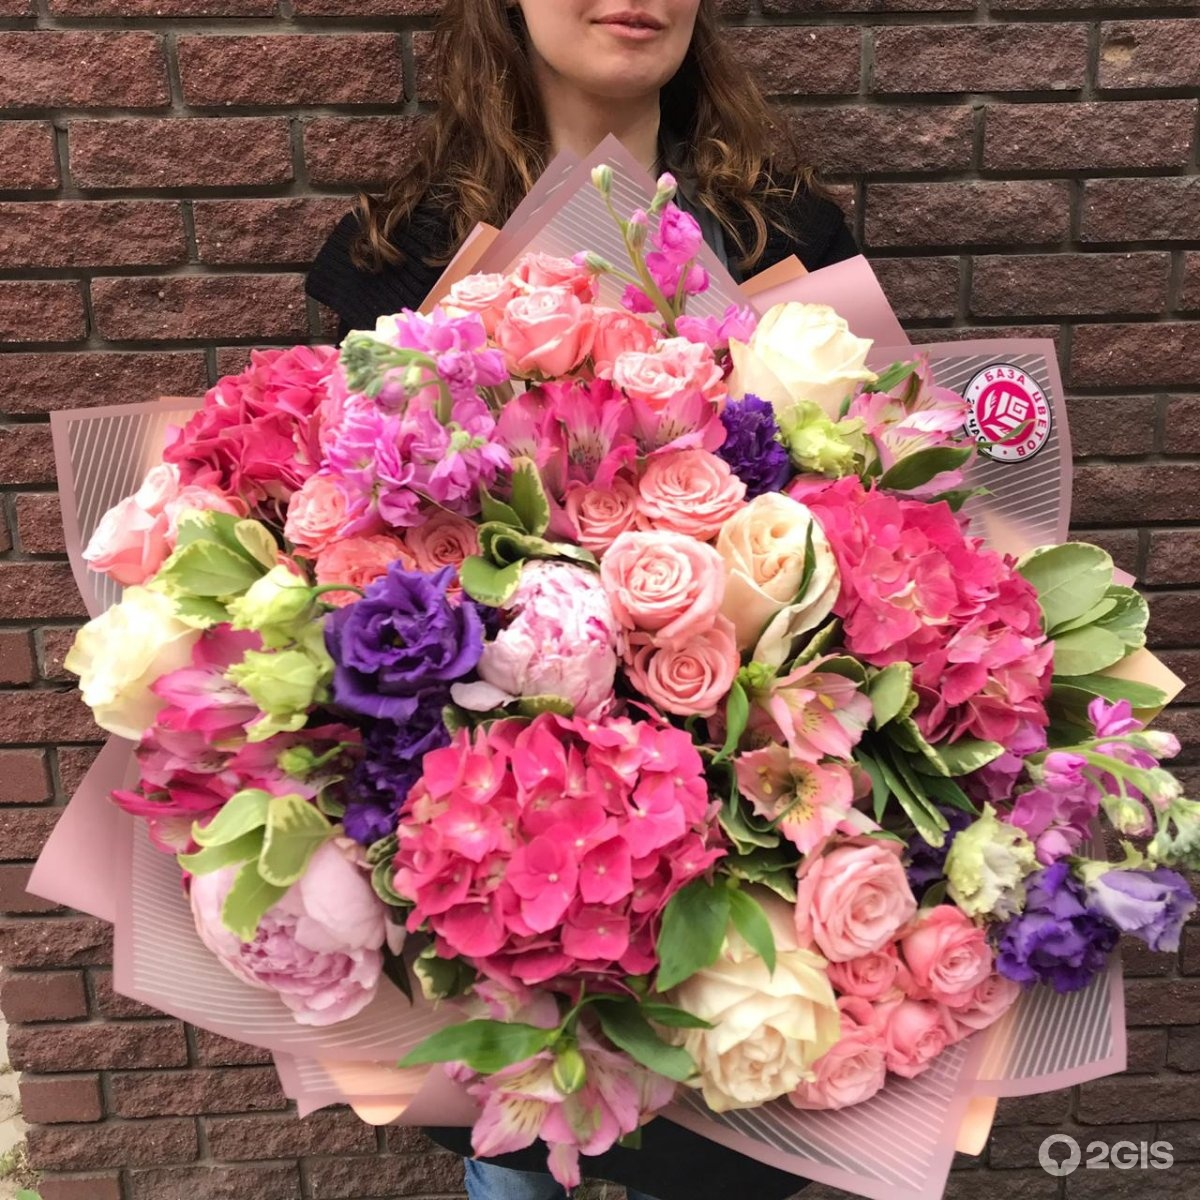 Цветов глоксиний, цветы опт нижний новгород